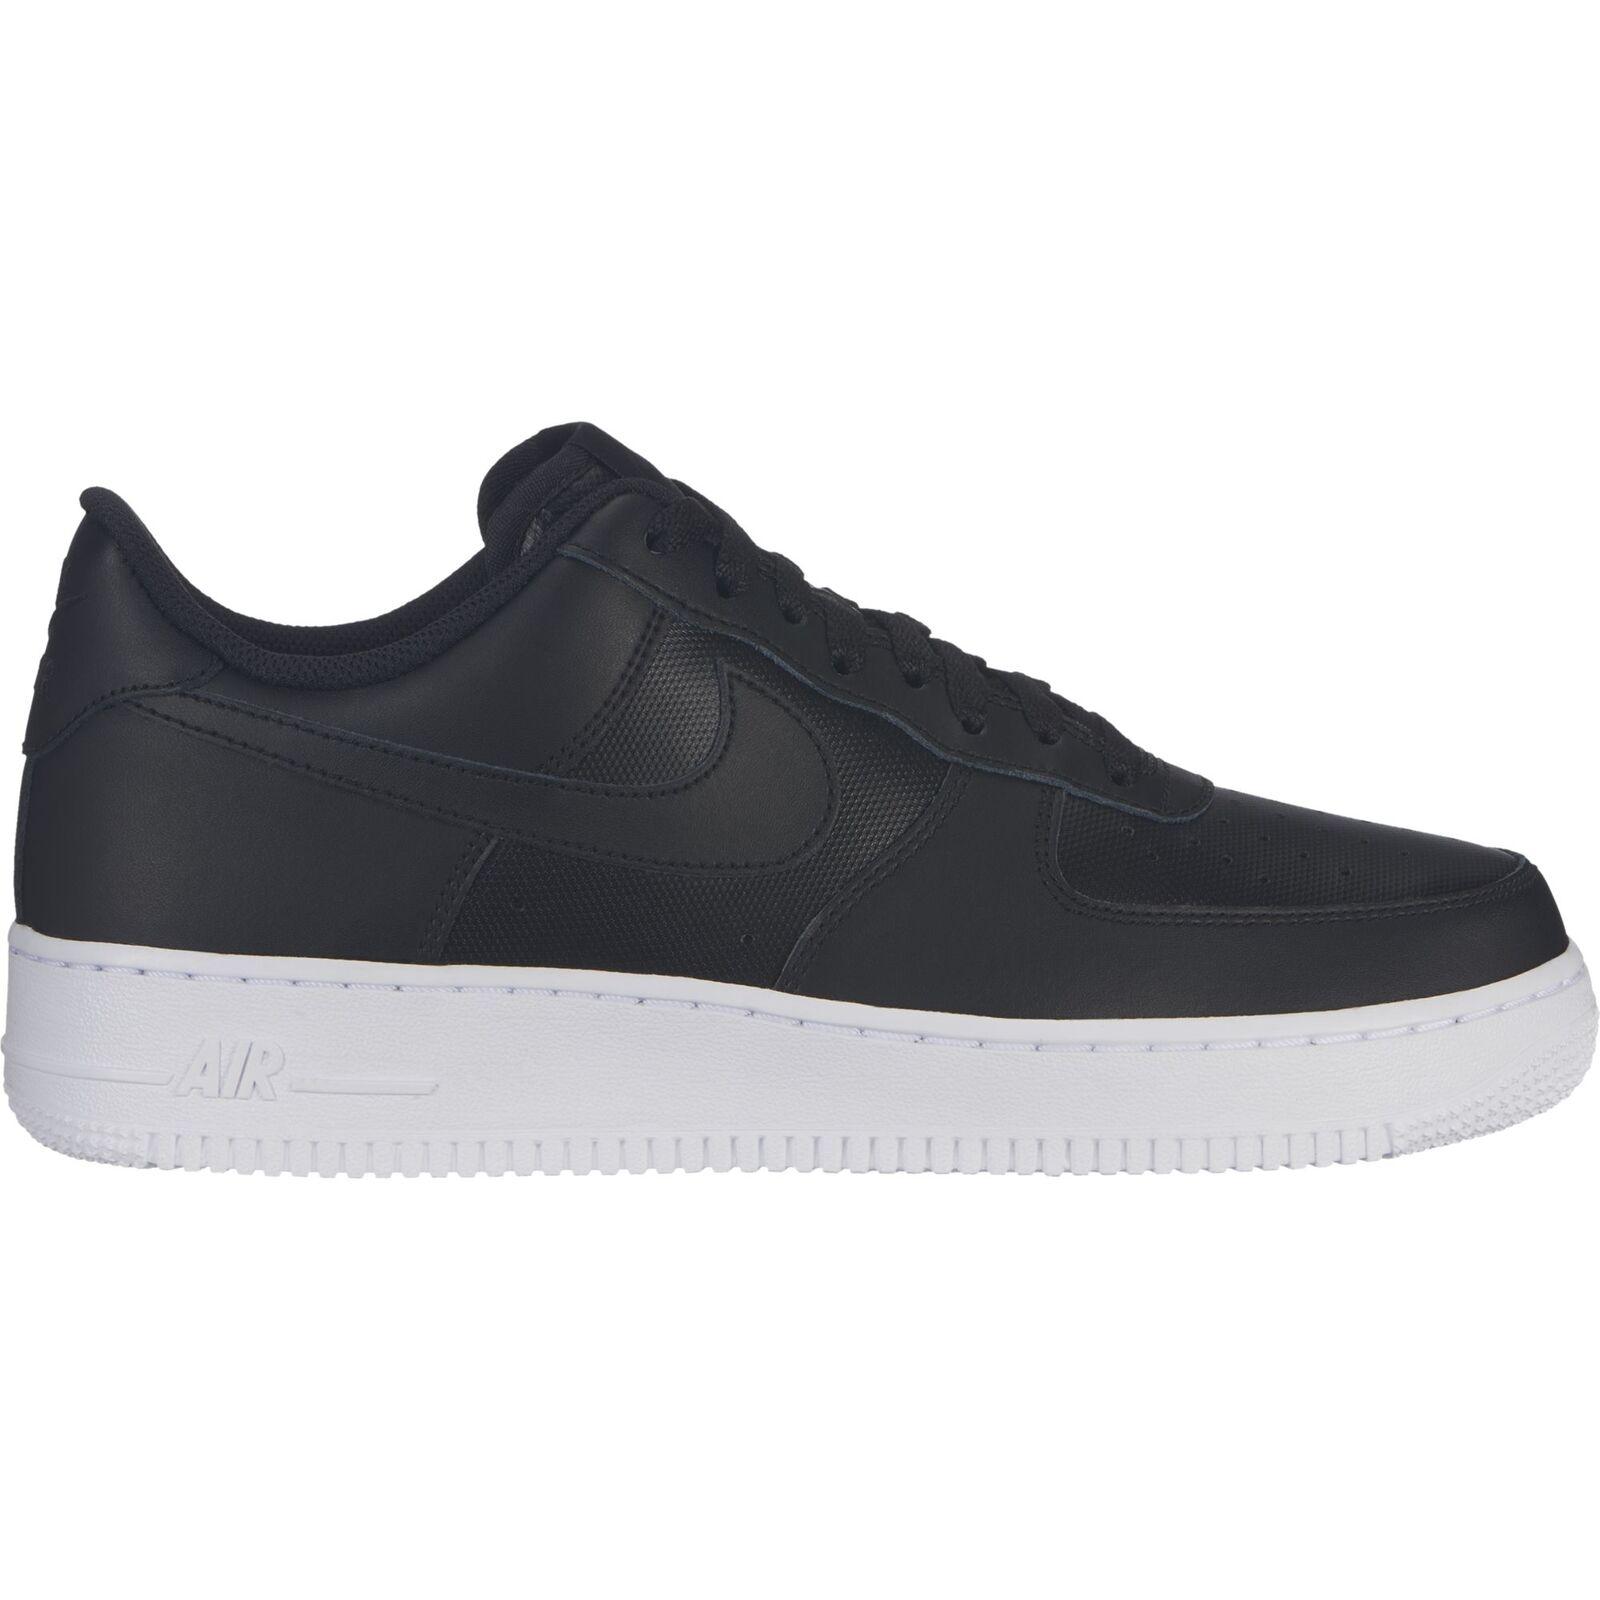 Nike Men's Air Force 1 '07 Sneakers, Black Black White